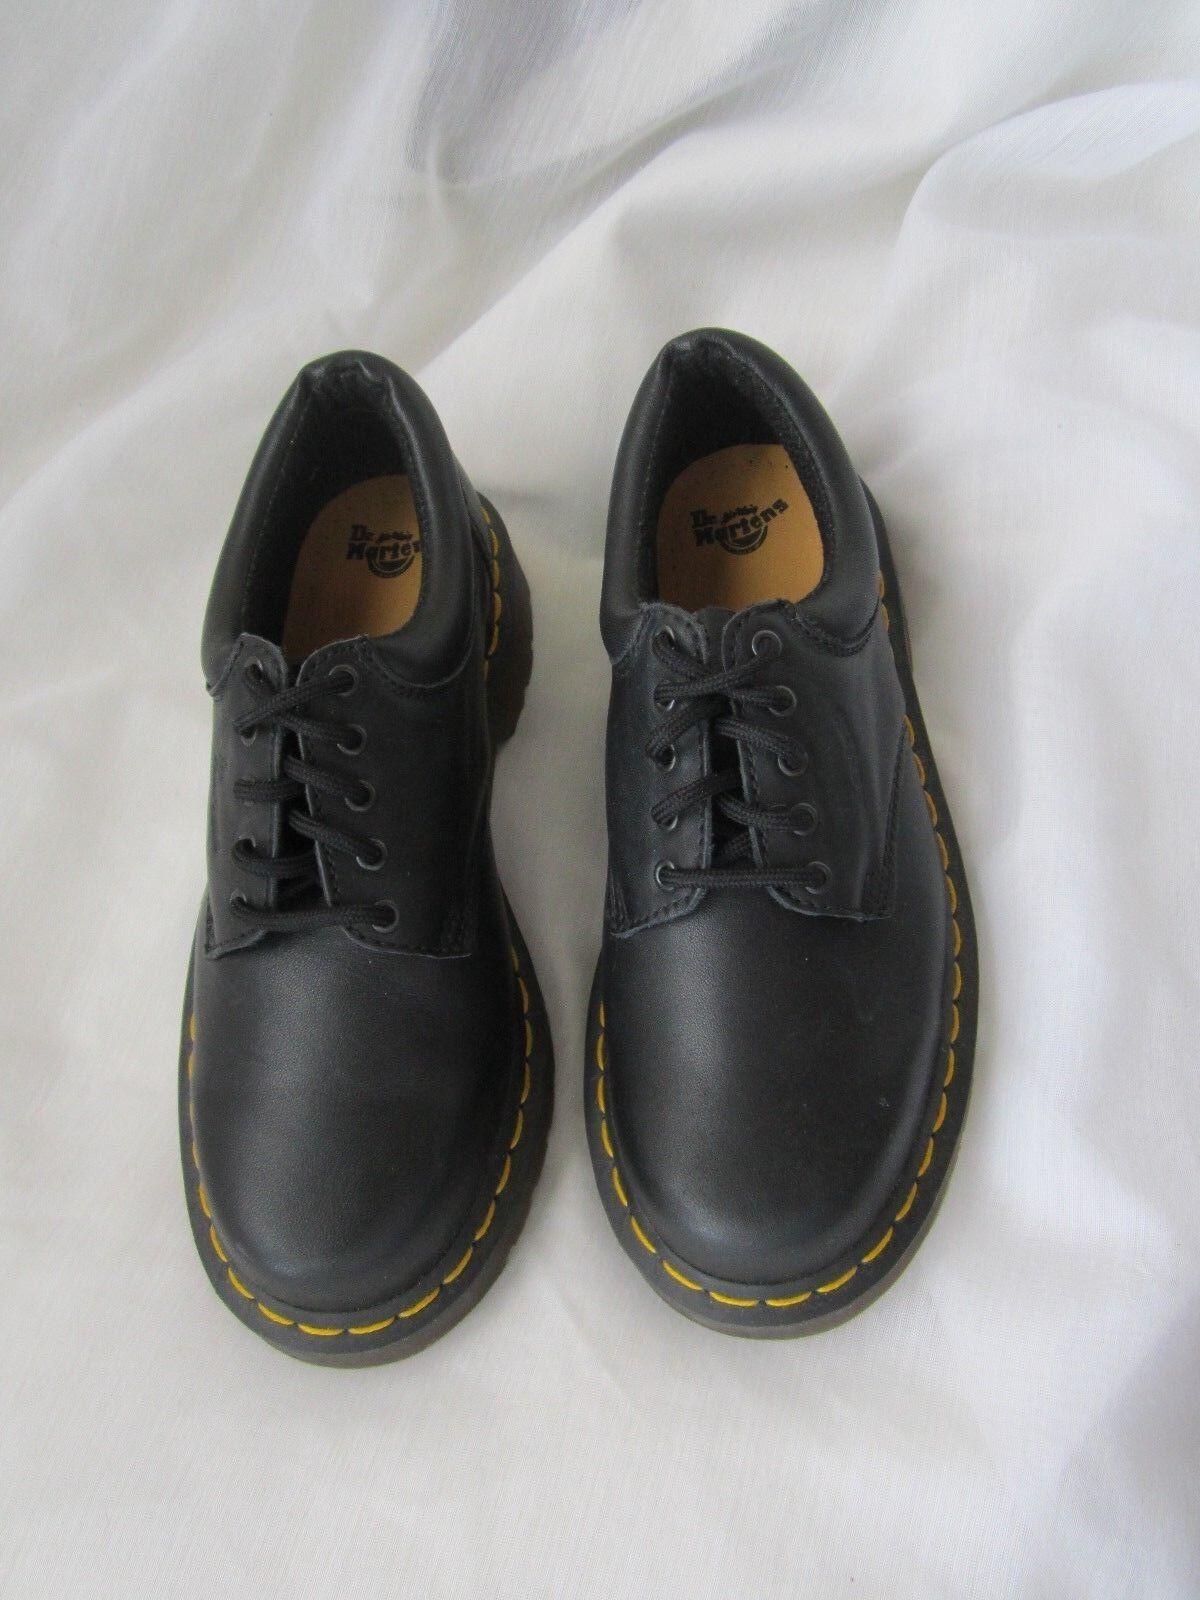 Dr Martens Original Airwalk Oxford Lace Up 5-Eyelet Shoe Taglia EU 38 USA 8-8.5